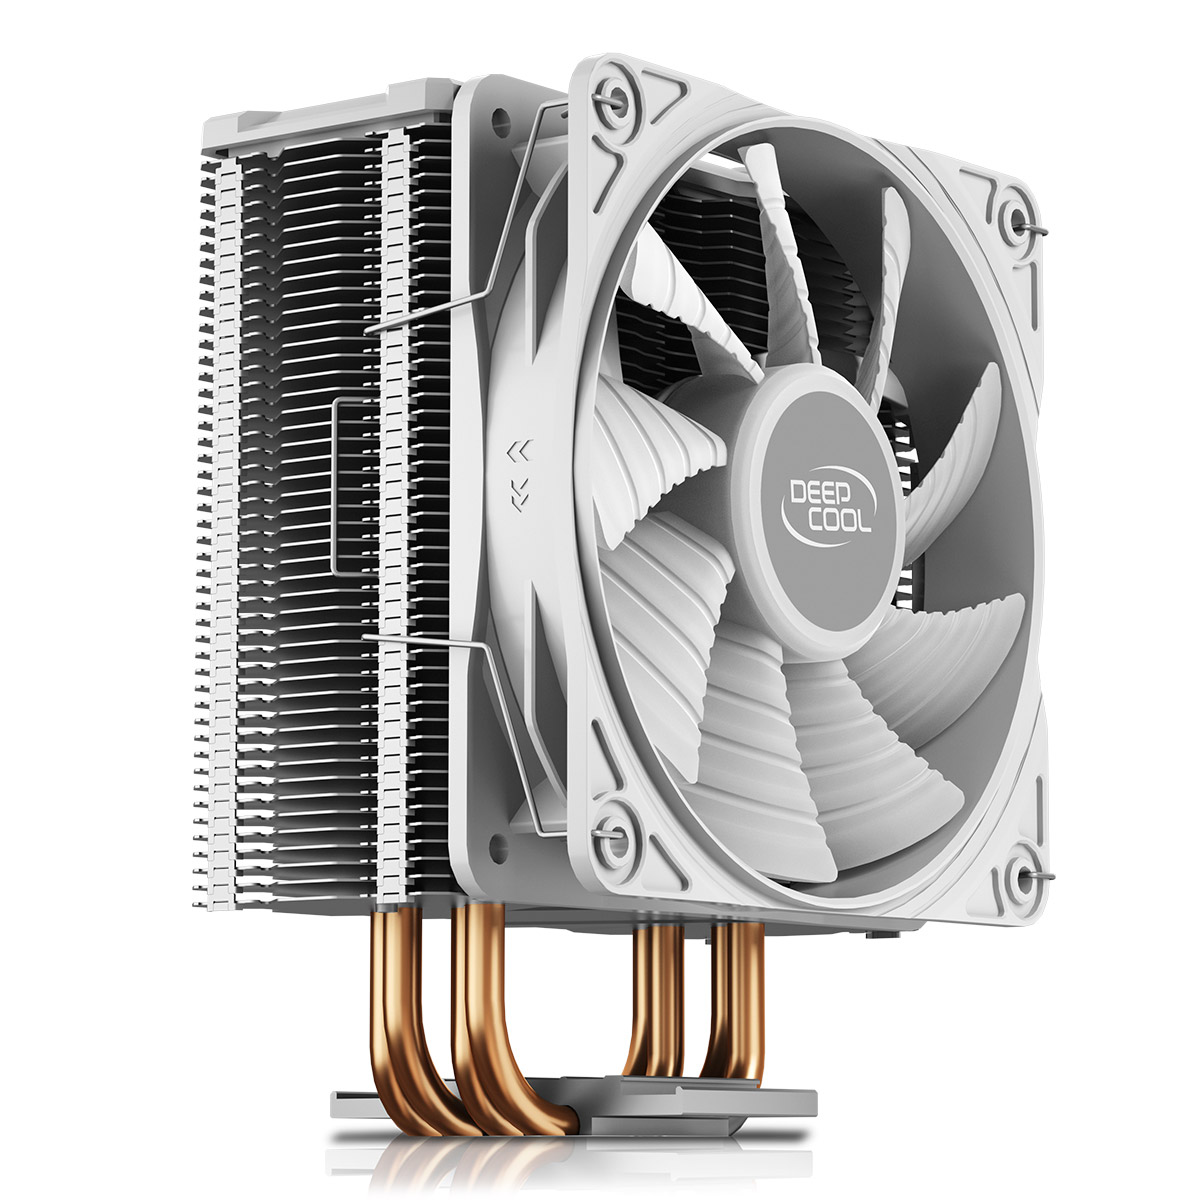 Deepcool Gammaxx GTE V2 White CPU Cooler